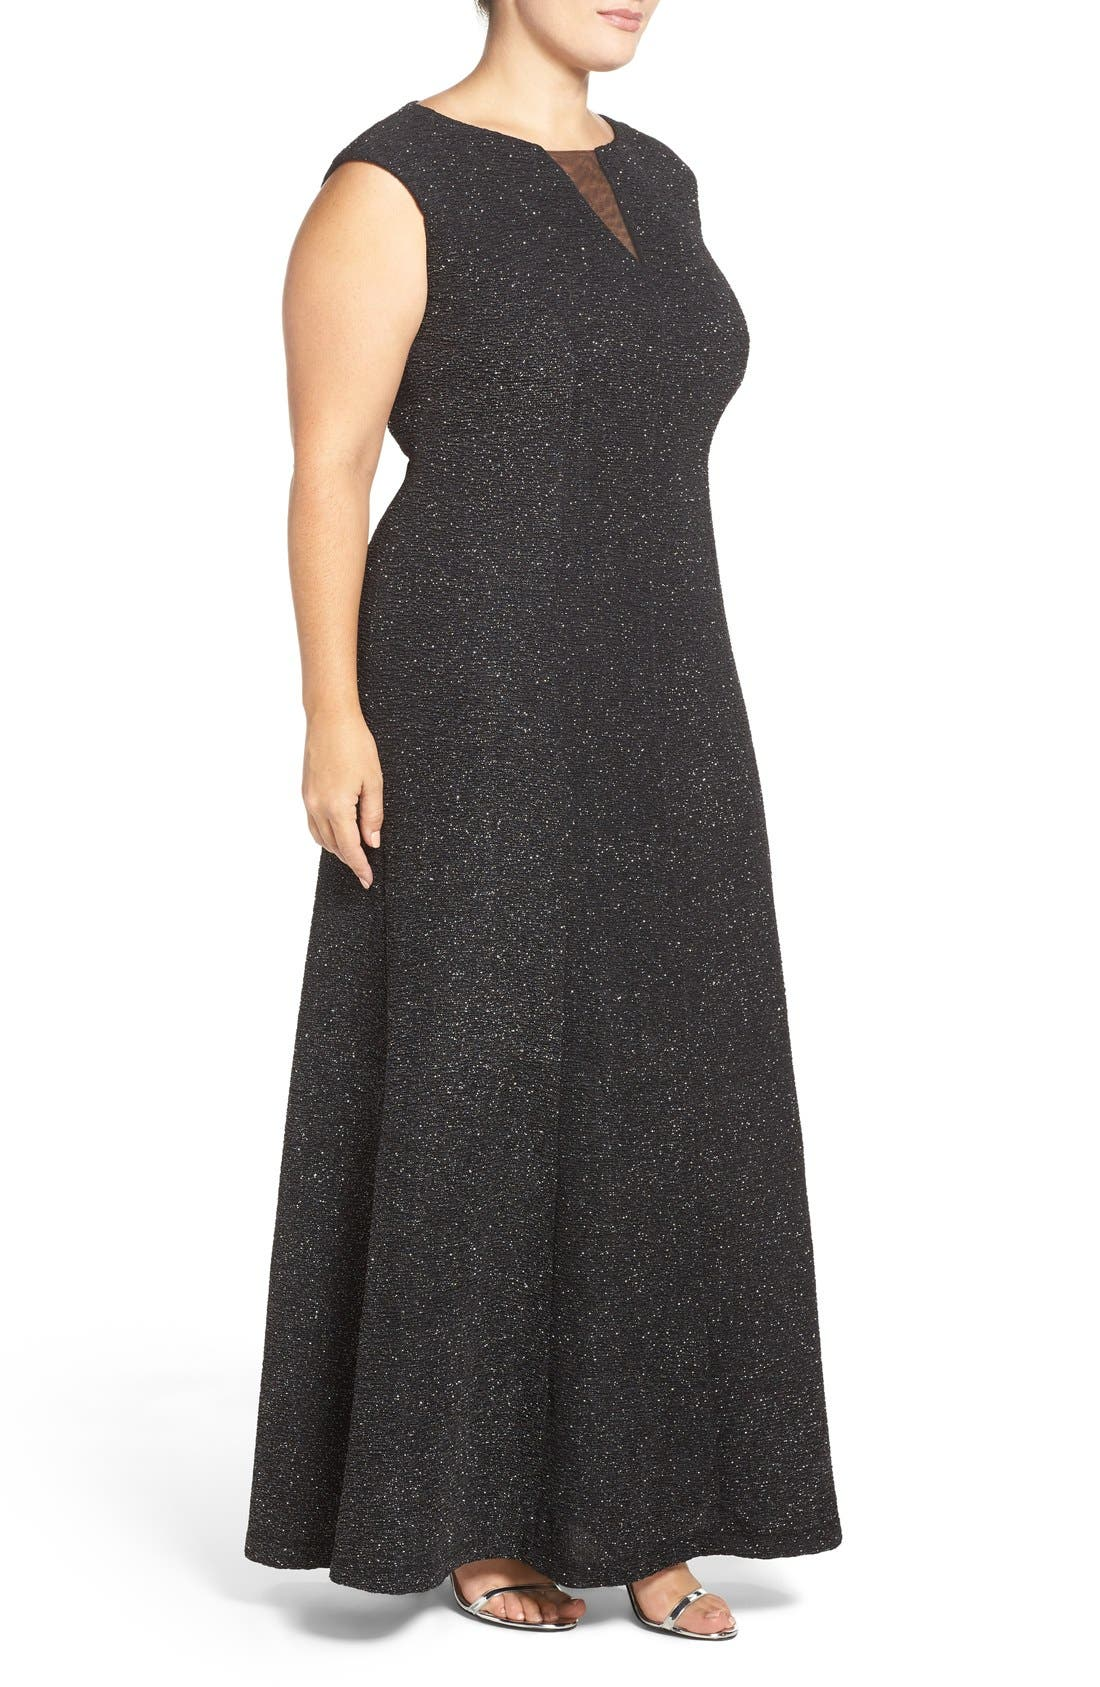 Cap Sleeve Mesh Inset Glitter Knit Gown,                             Alternate thumbnail 3, color,                             Black/ Silver